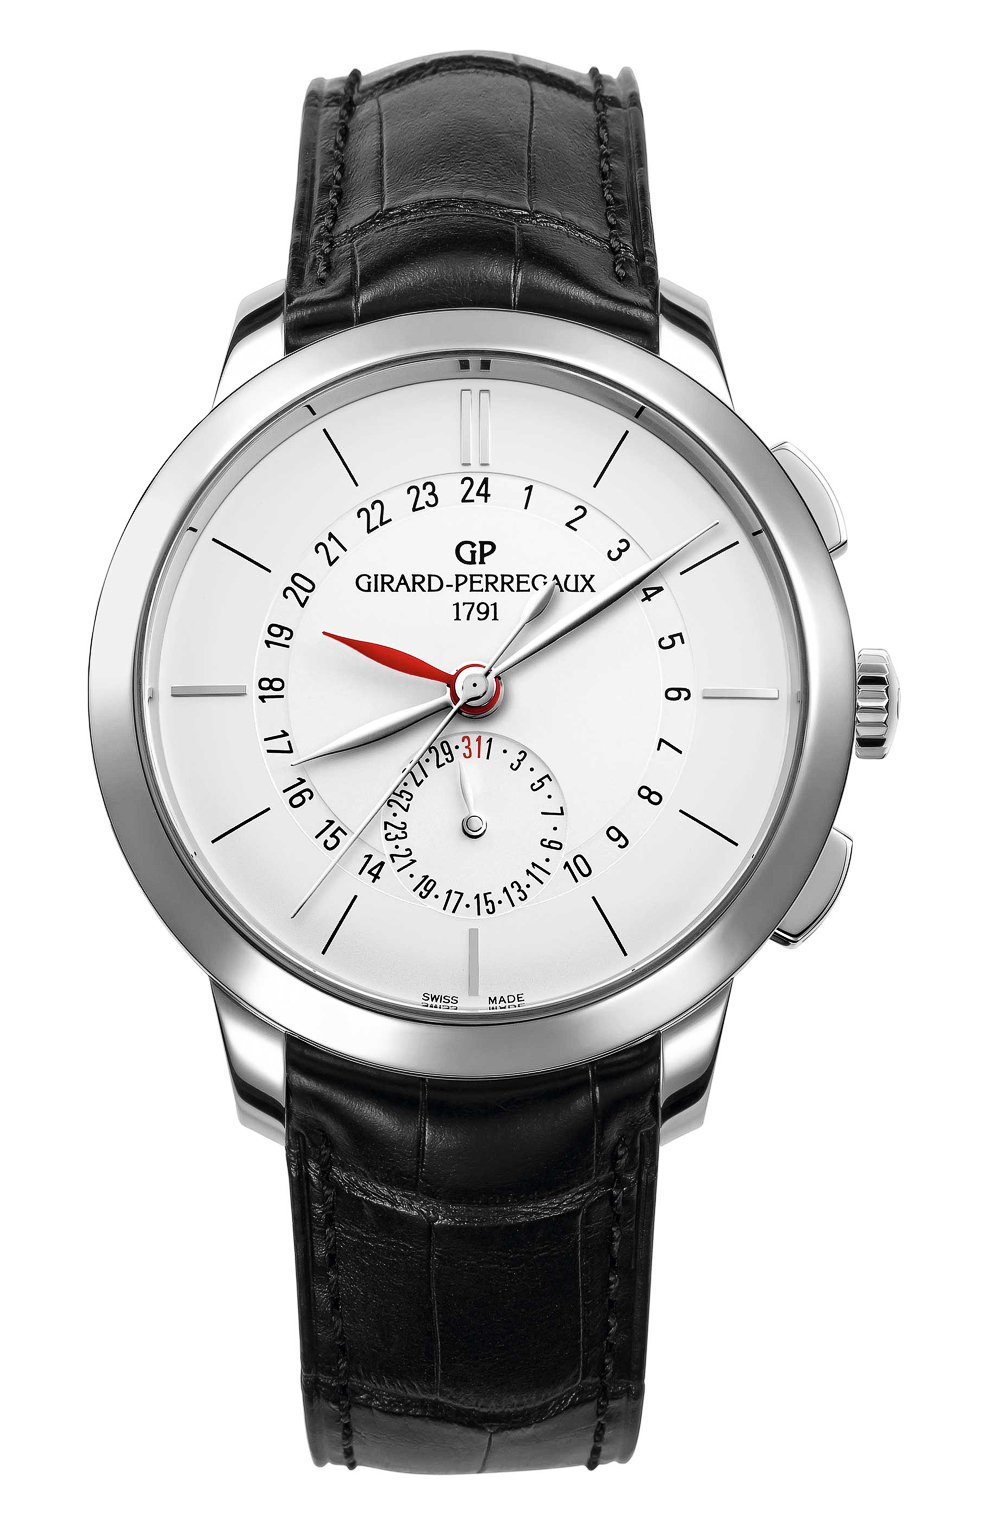 Мужские часы dual time steel white GIRARD-PERREGAUX белого цвета, арт. 49544-11-132-BB60 | Фото 1